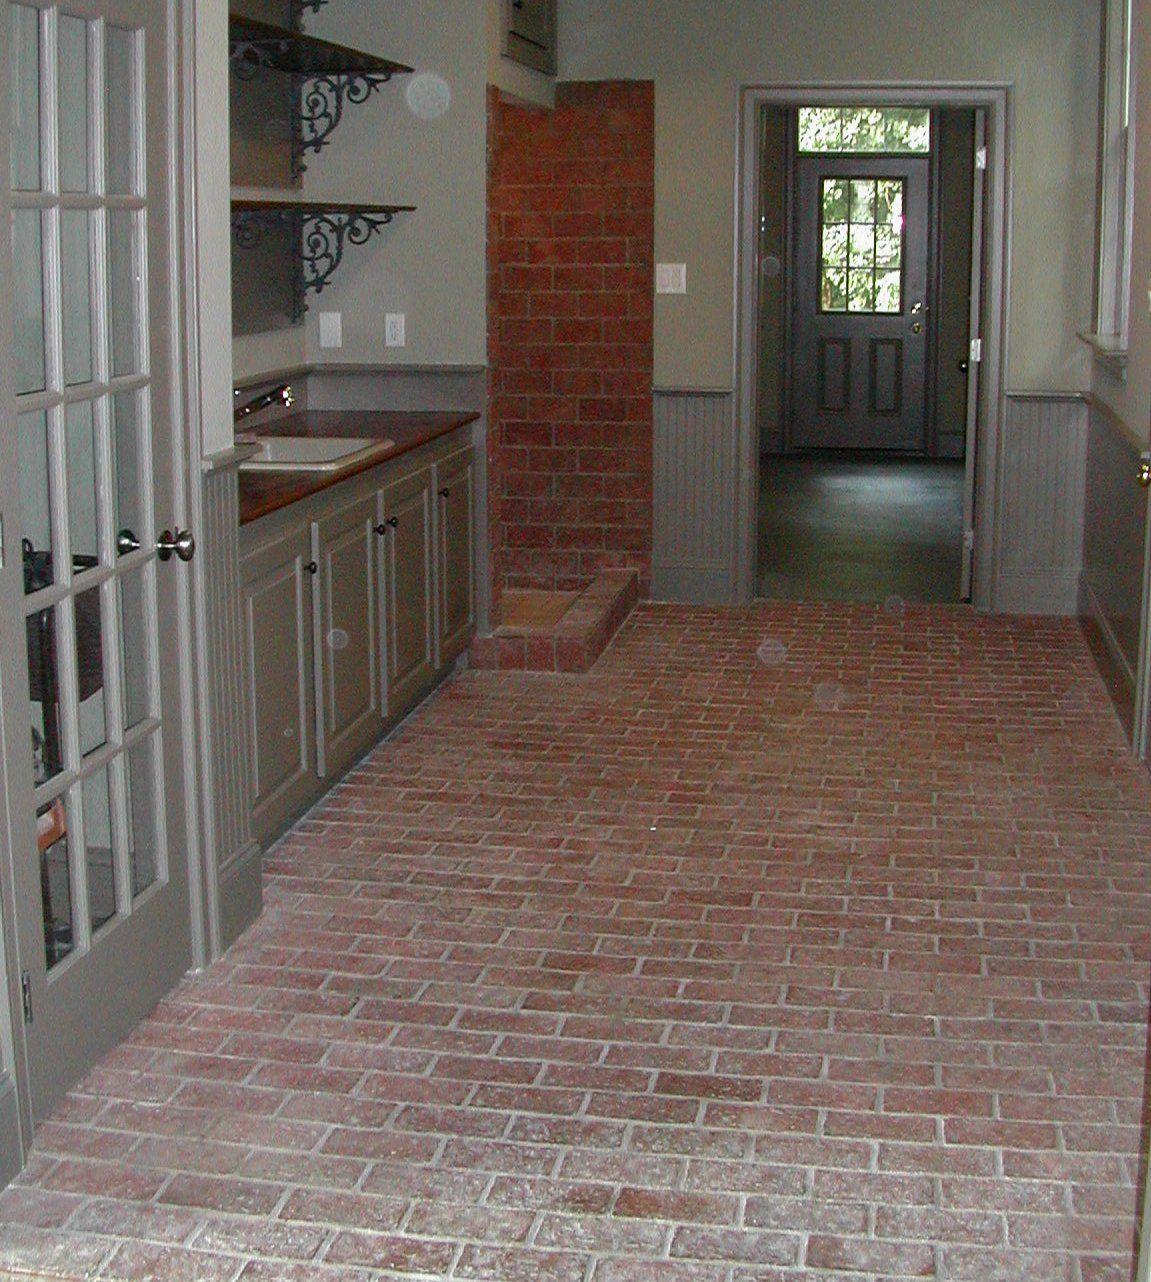 Kitchen Brick Floor Brick Floor Mudroom With Sink Shower And Storage Folksit Does